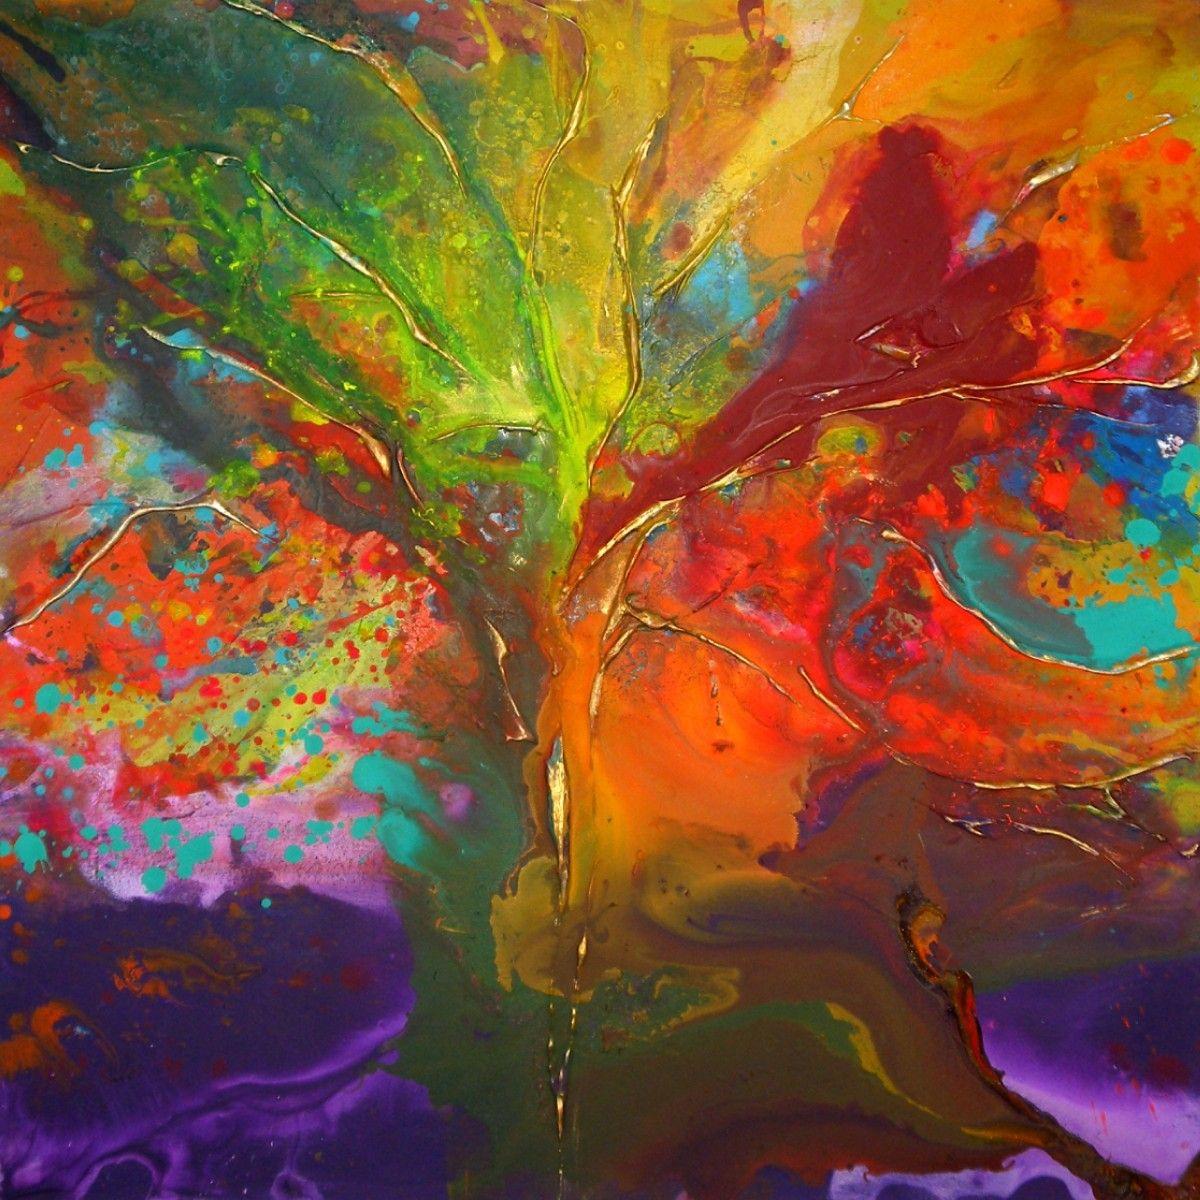 famous spiritual artists - Google Search | 2015 ...